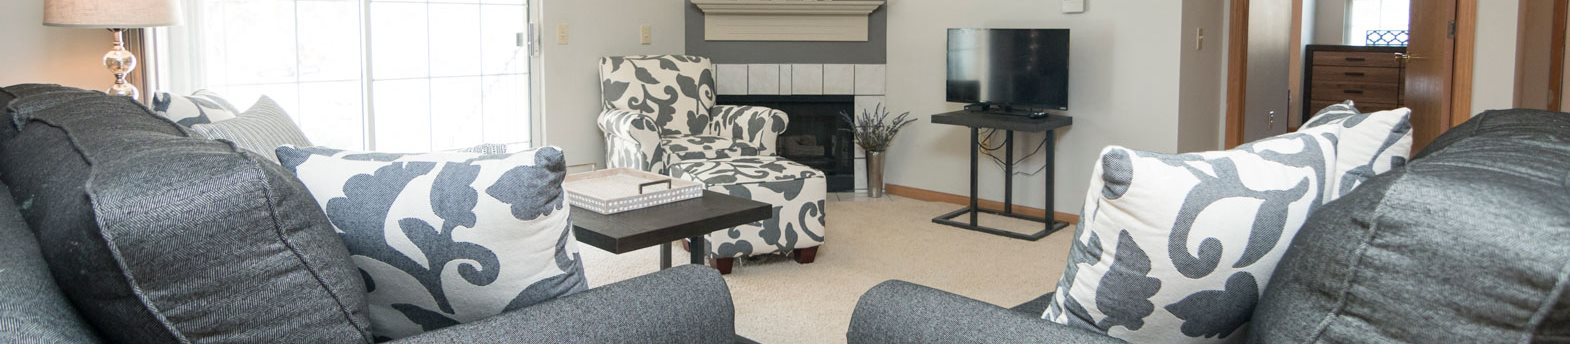 Eagle Run Apartments in Omaha NE